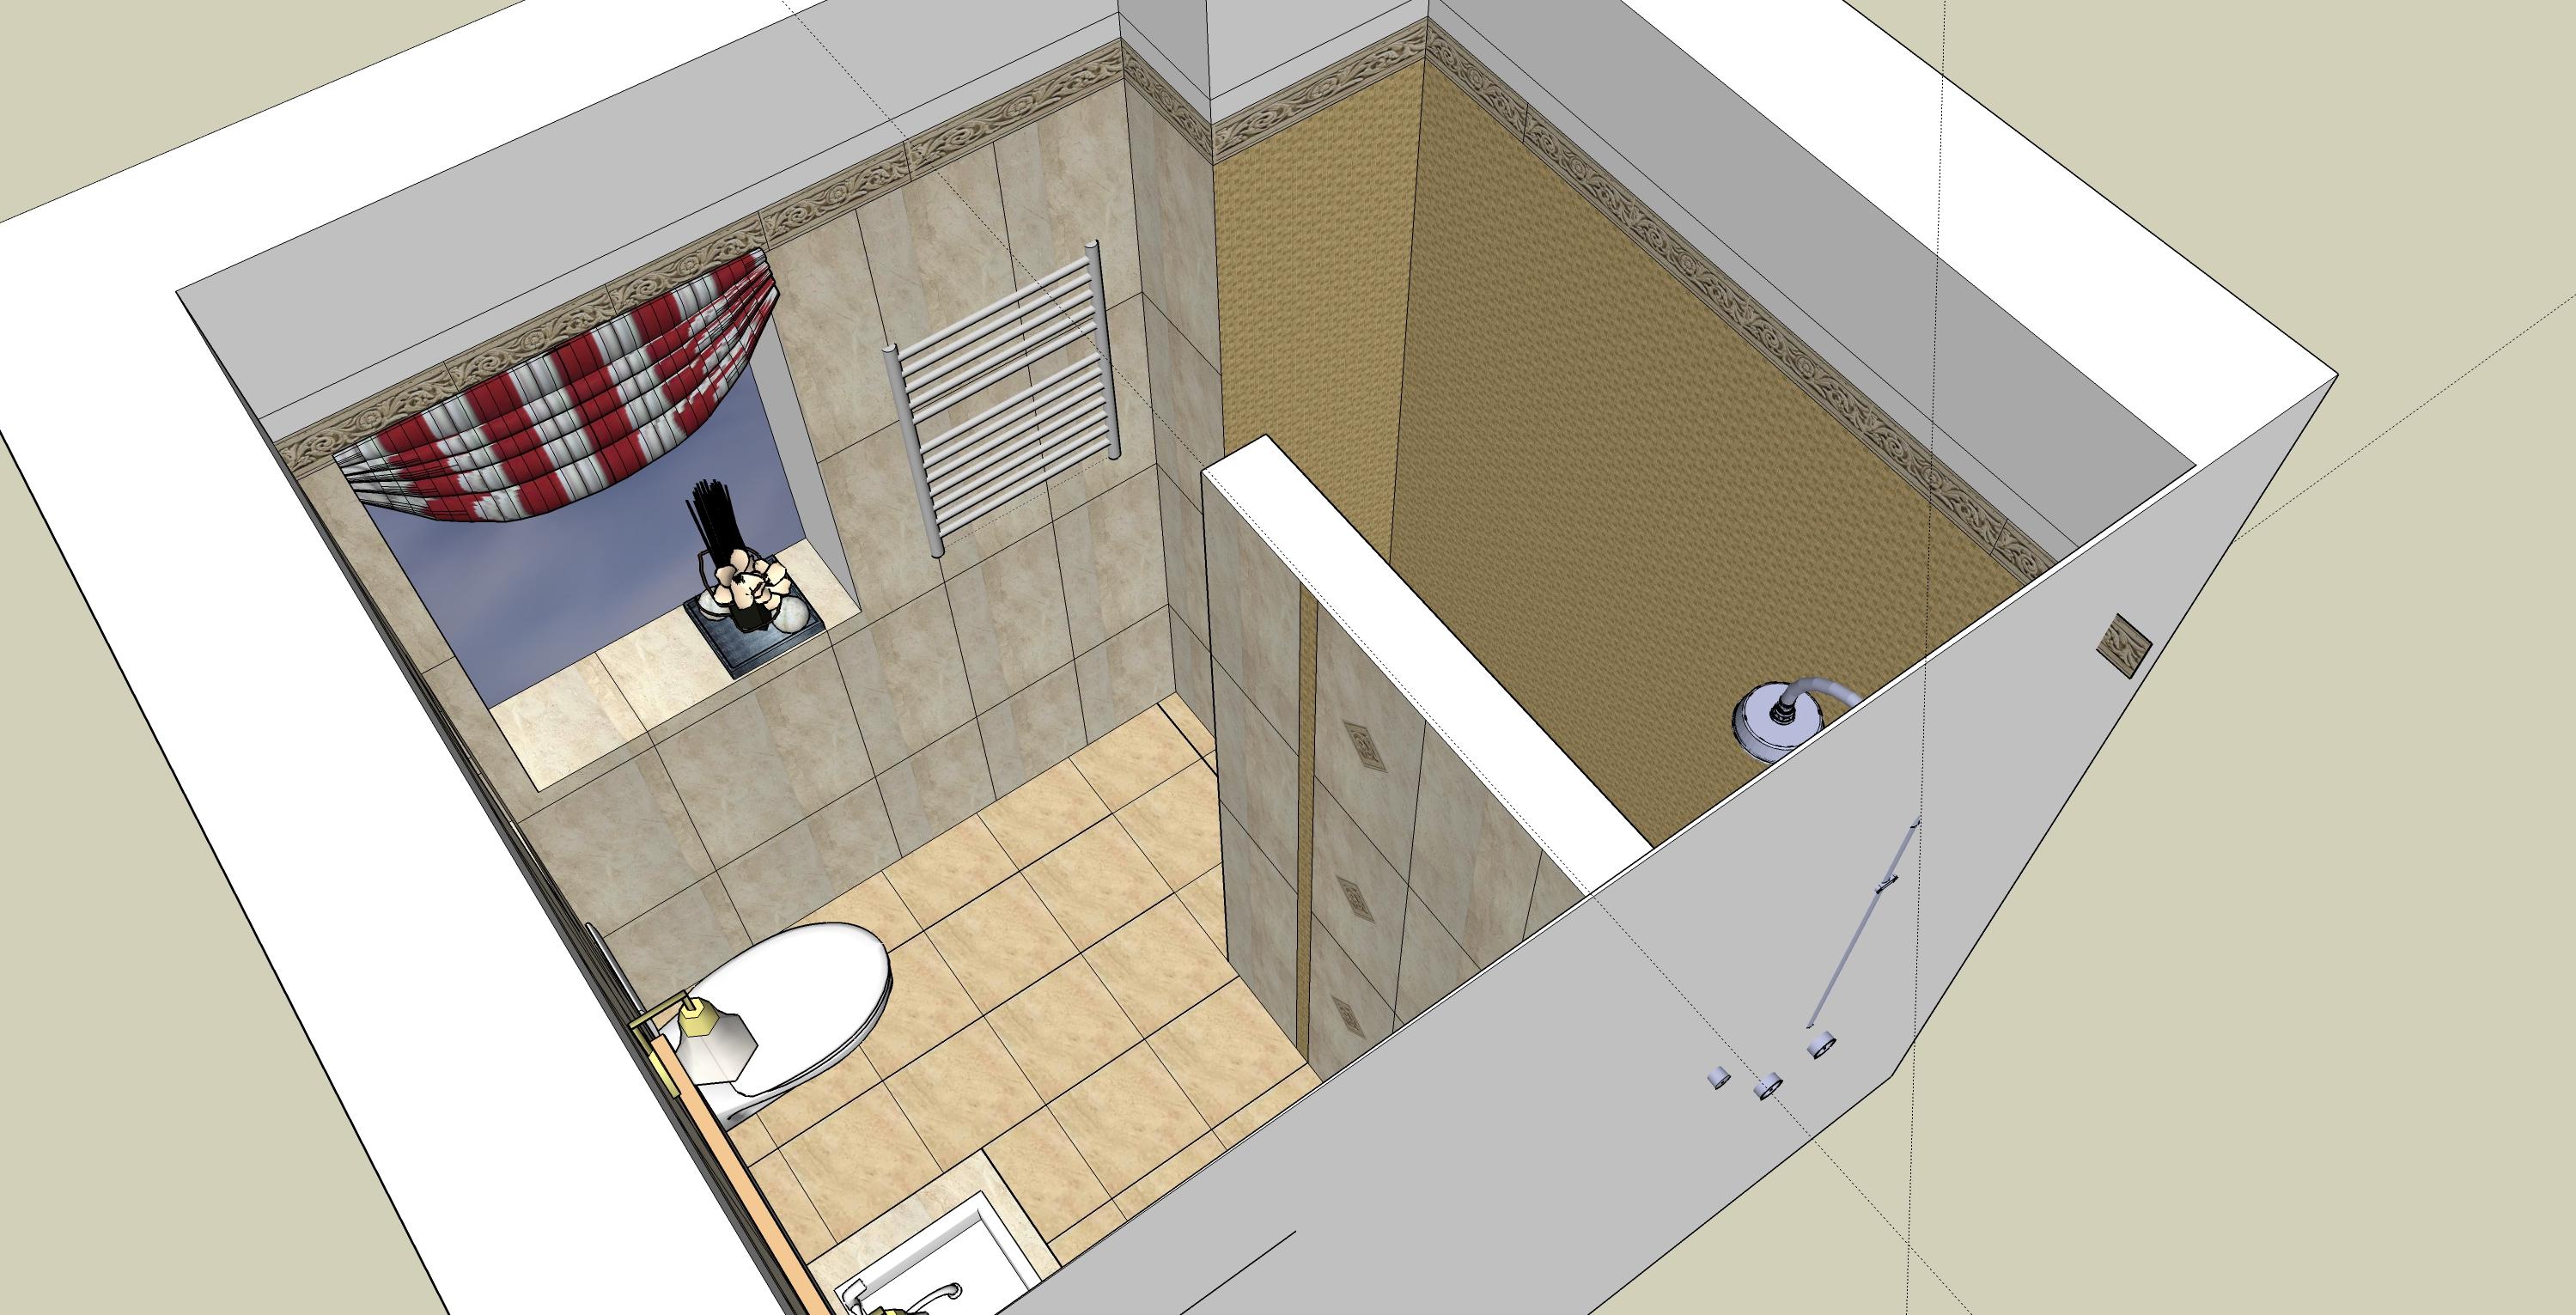 łazienka sketchUp-perspektywa2